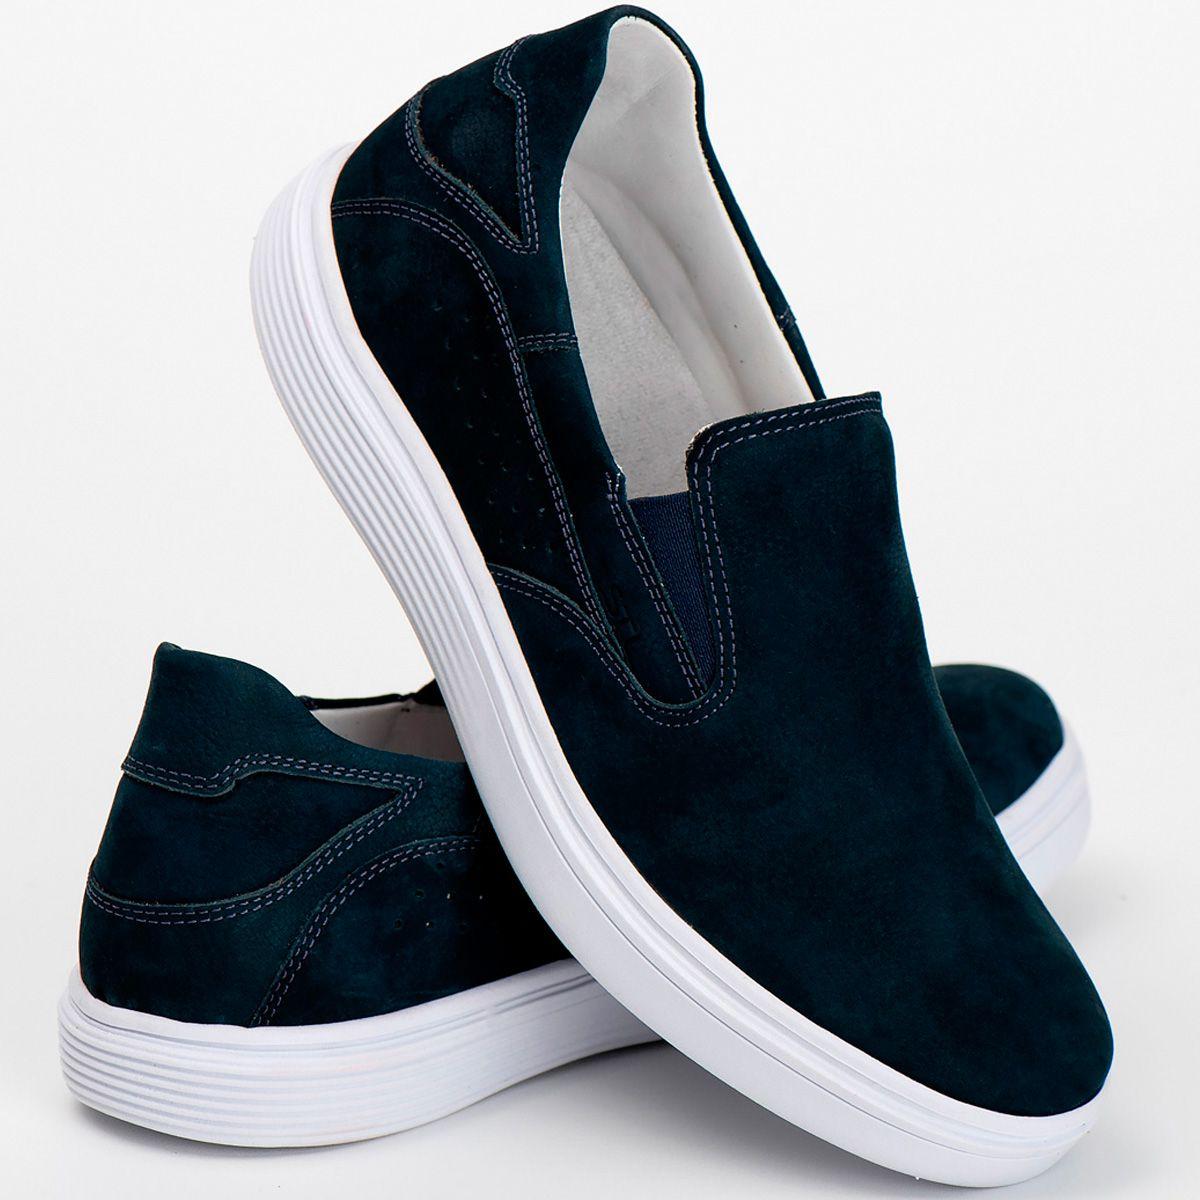 Slip on Masculino Couro Nobuck Azul Ranster Comfort - 3018